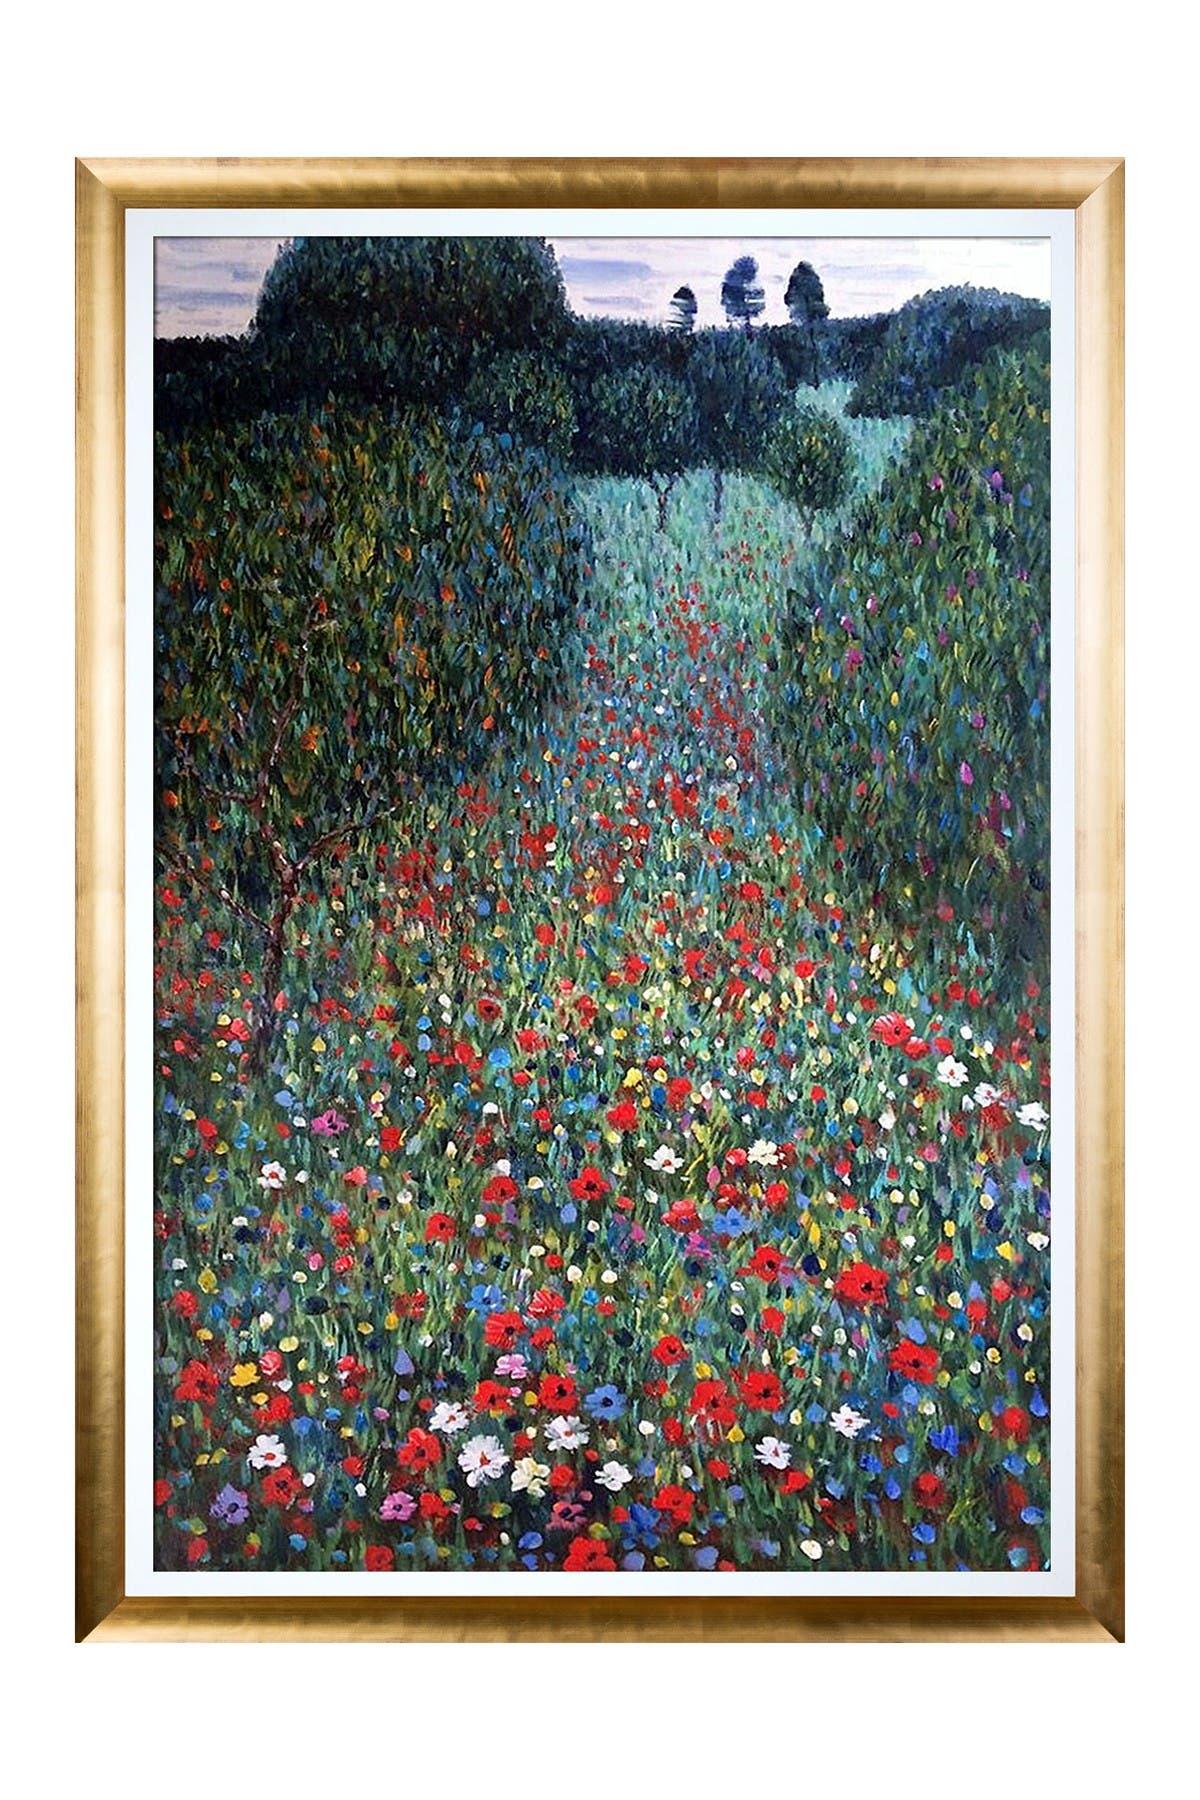 Poppy Field Framed Oil reproduction of an original painting by Gustav Klimt at Nordstrom Rack